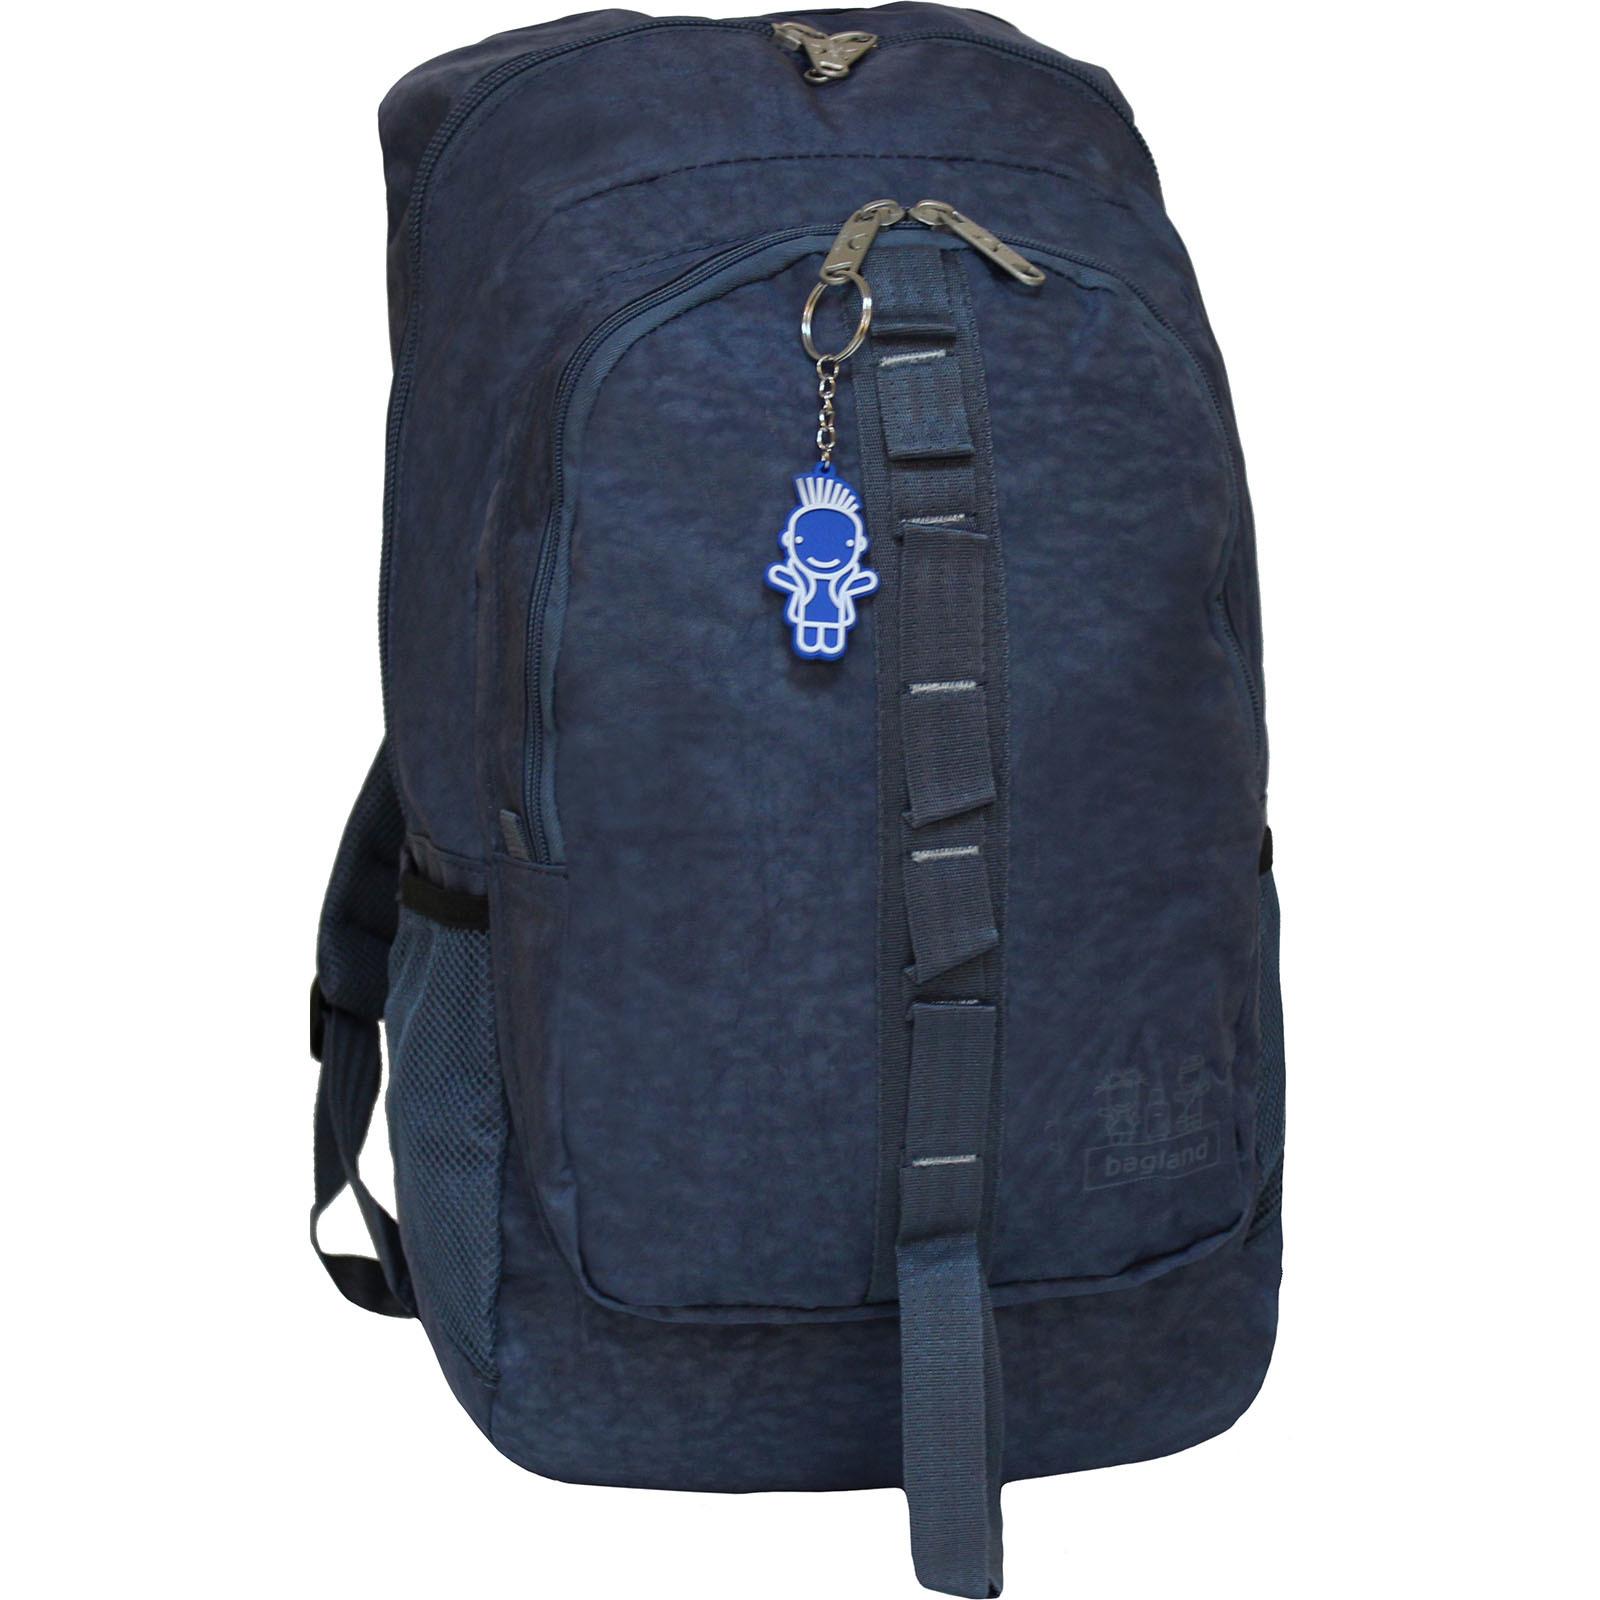 Городские рюкзаки Рюкзак Bagland Тайфун 26 л. Серый (0017770) IMG_0237.JPG